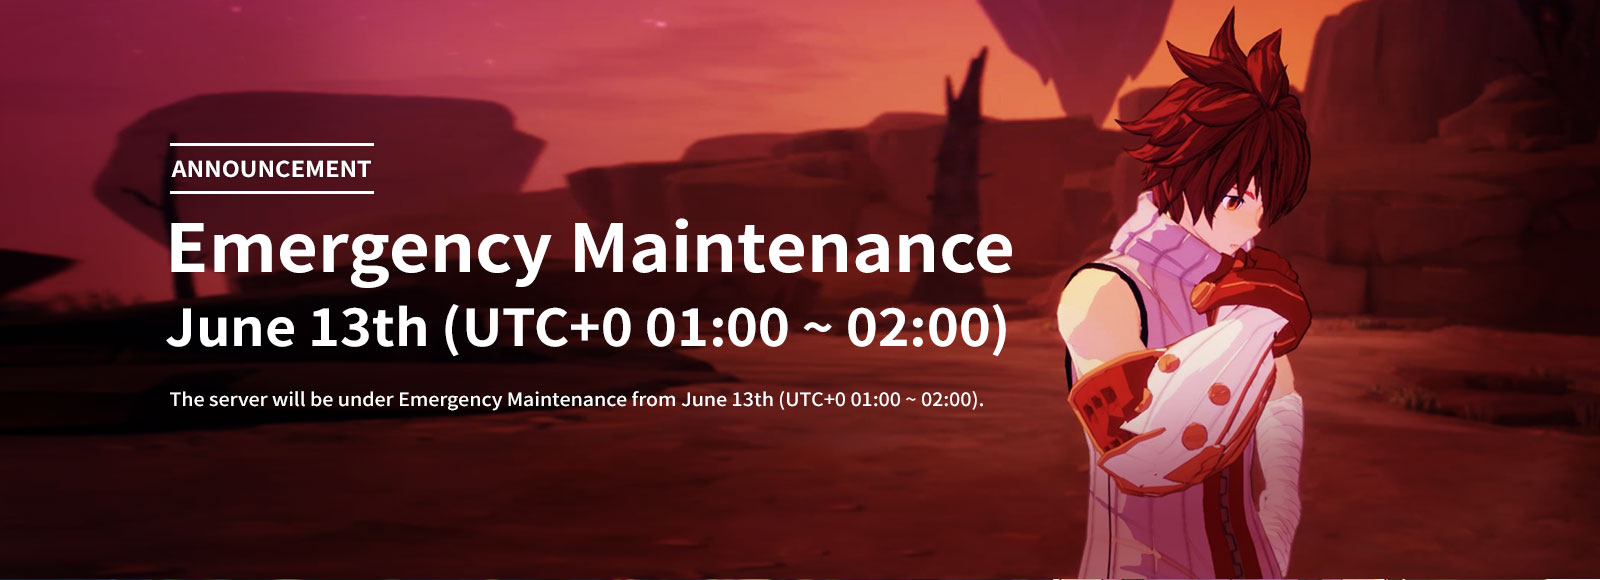 June 13th Emergency Maintenance Announcement